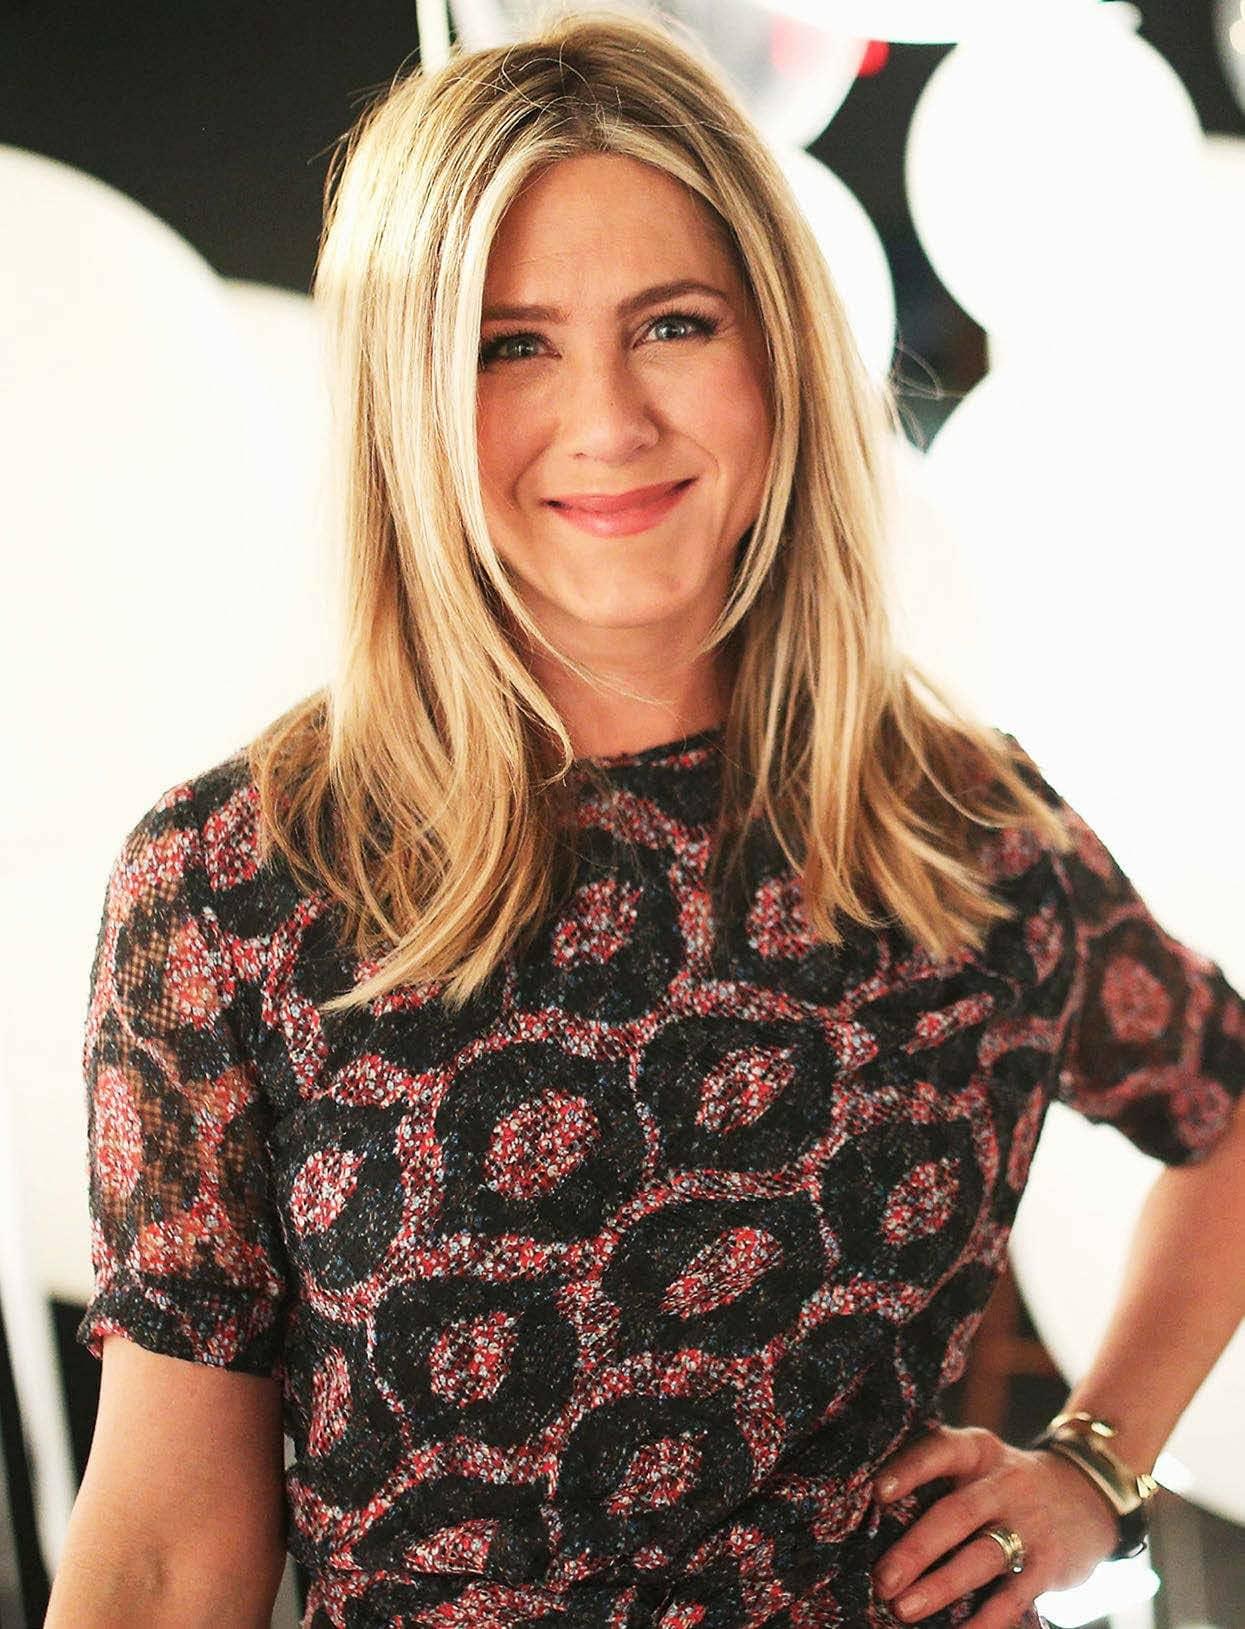 Jennifer Aniston 'I Haven't Given Up On Love'